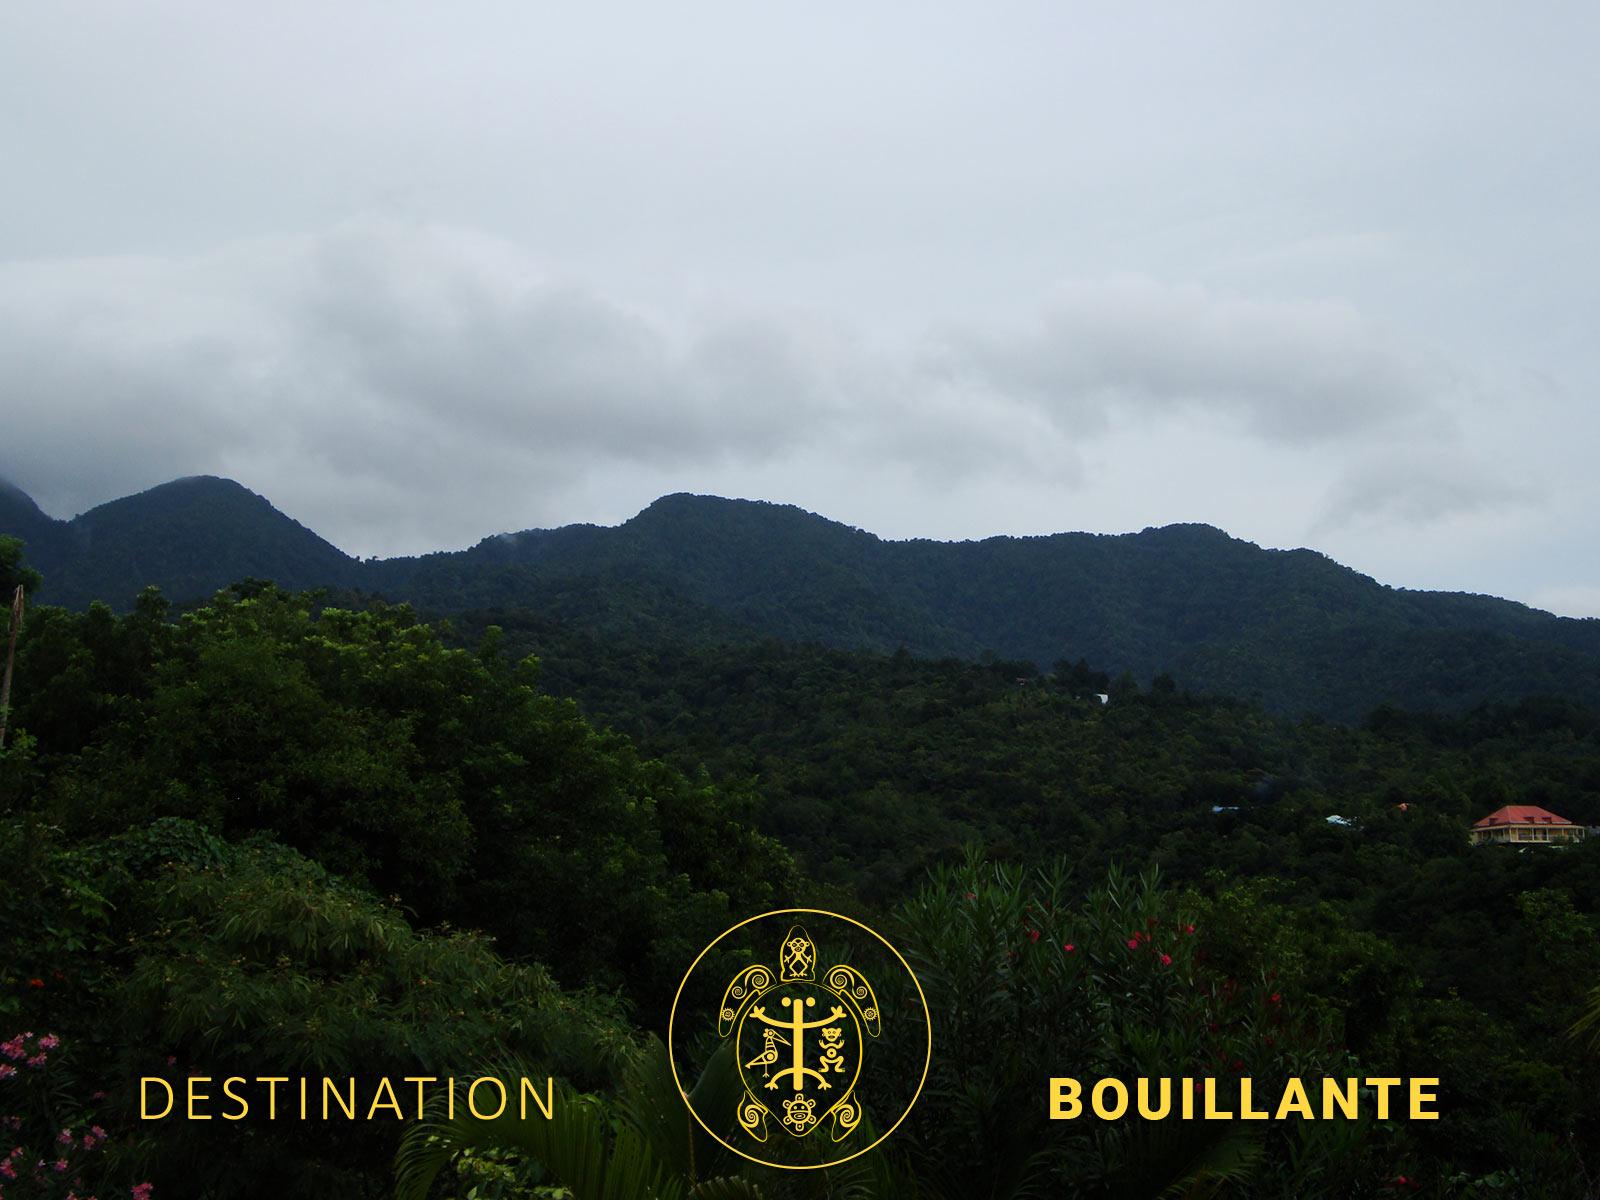 Piton Bouillante - ancien volcan de Bouillante